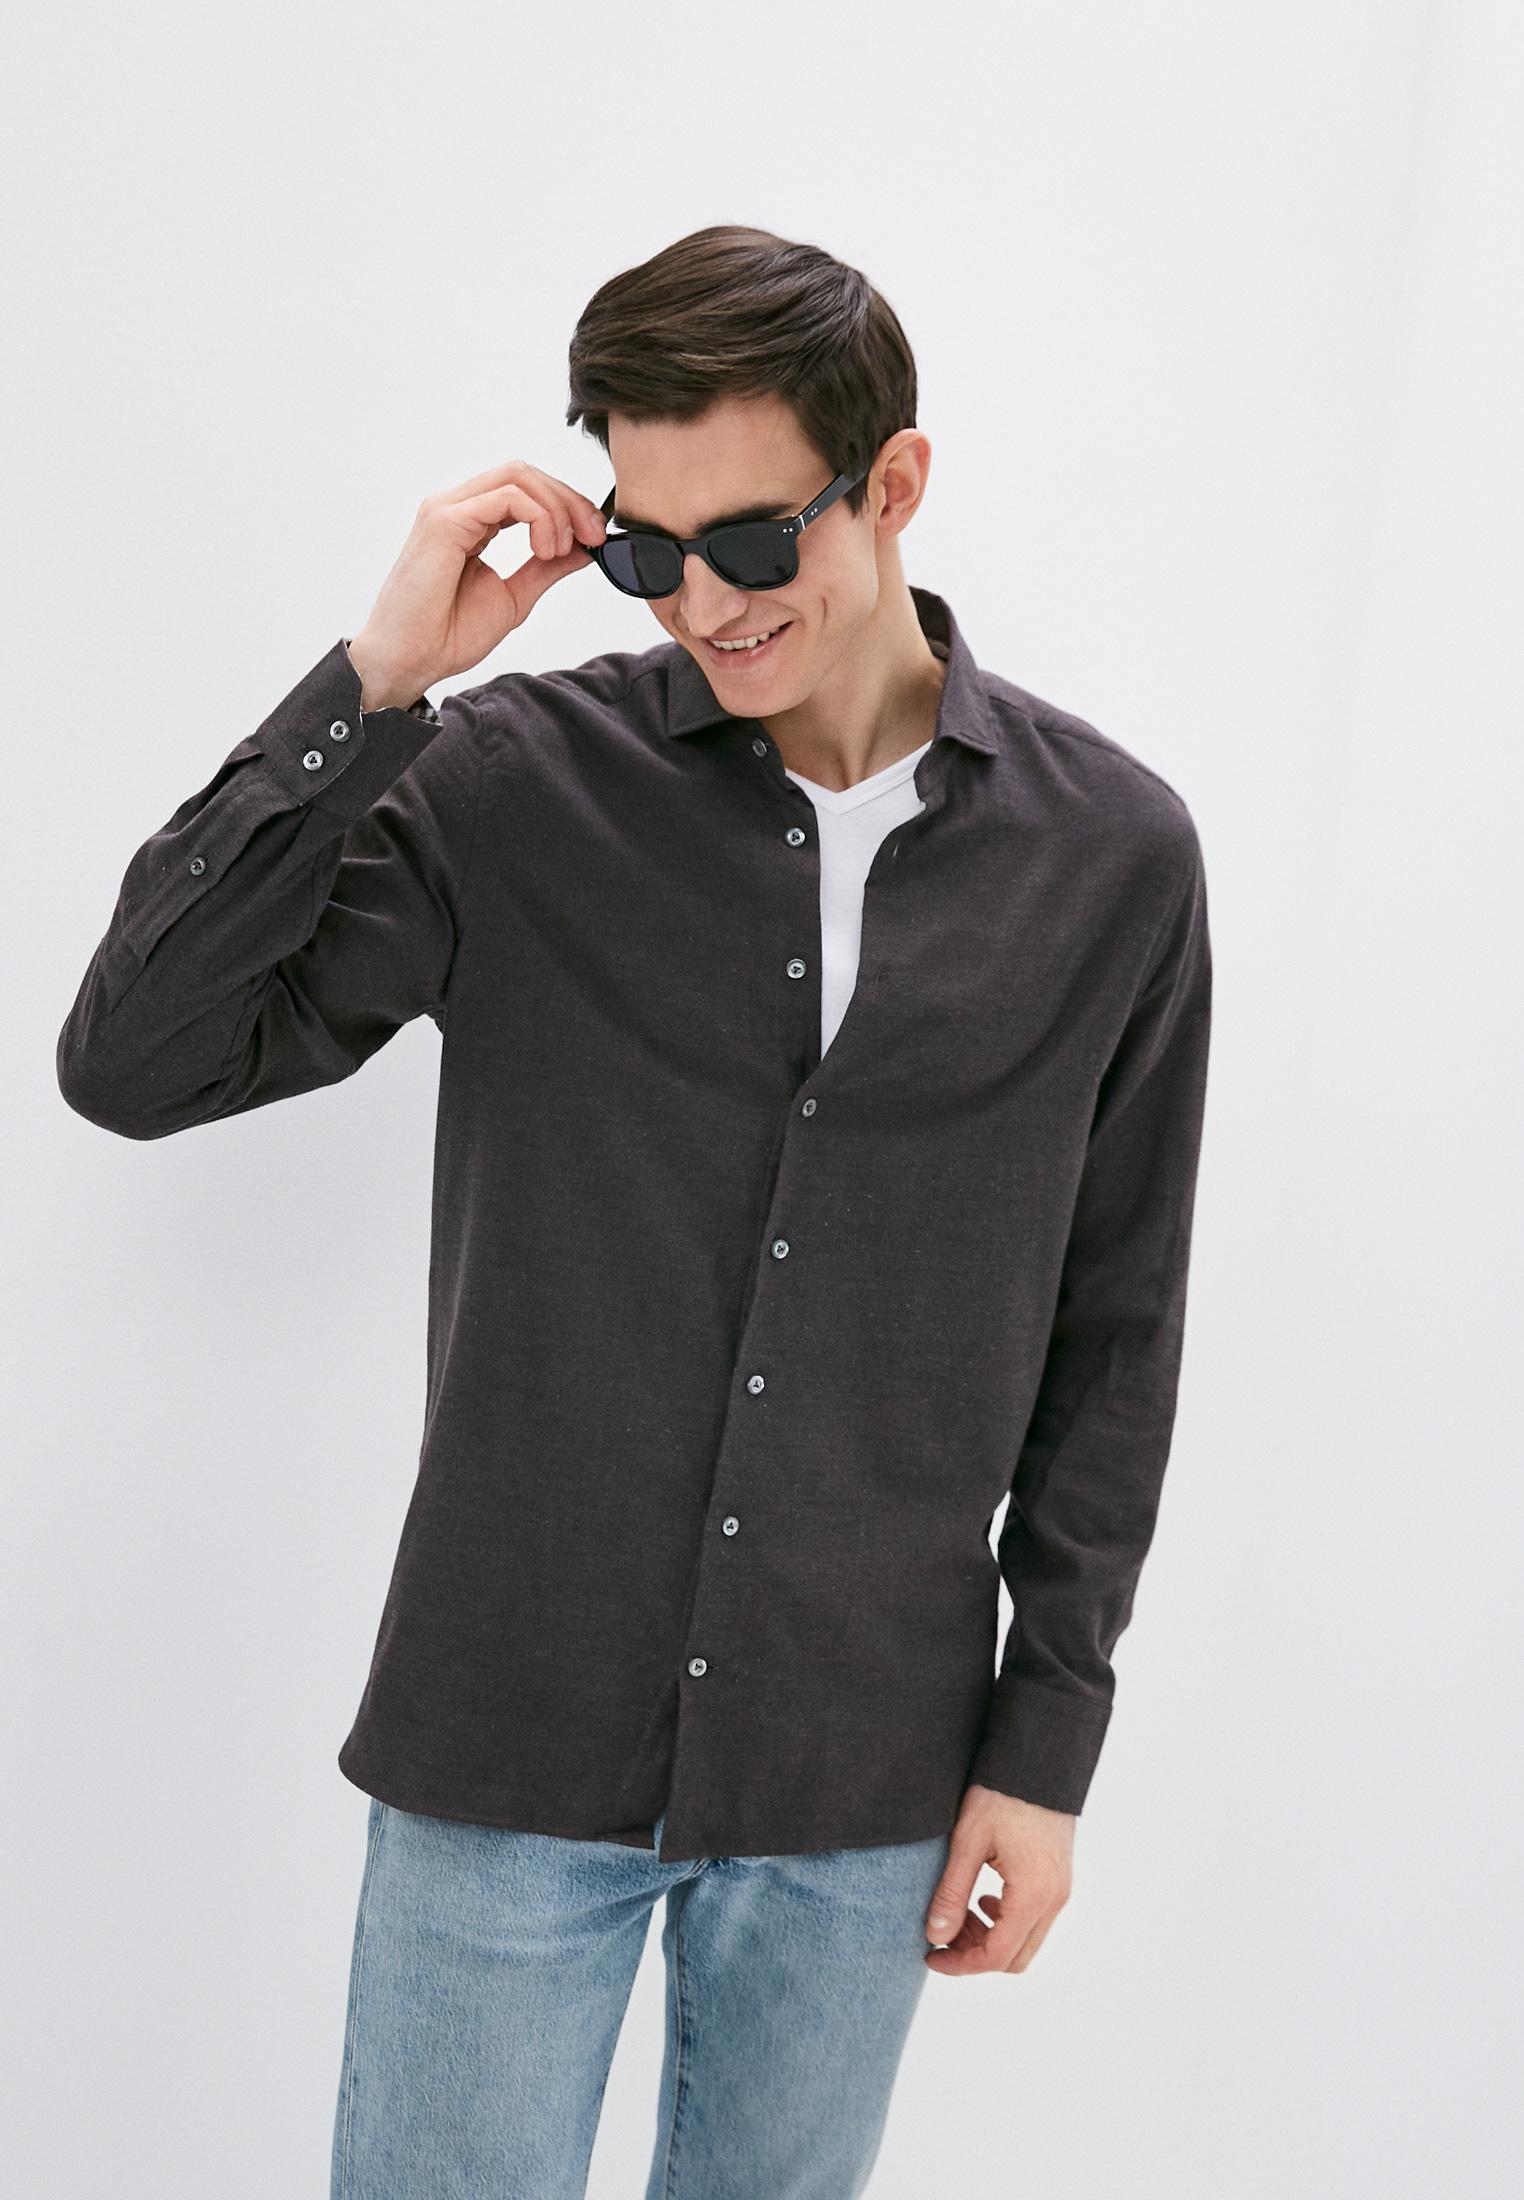 Рубашка с длинным рукавом VAN LAACK RANDO-TF09_156267_ST